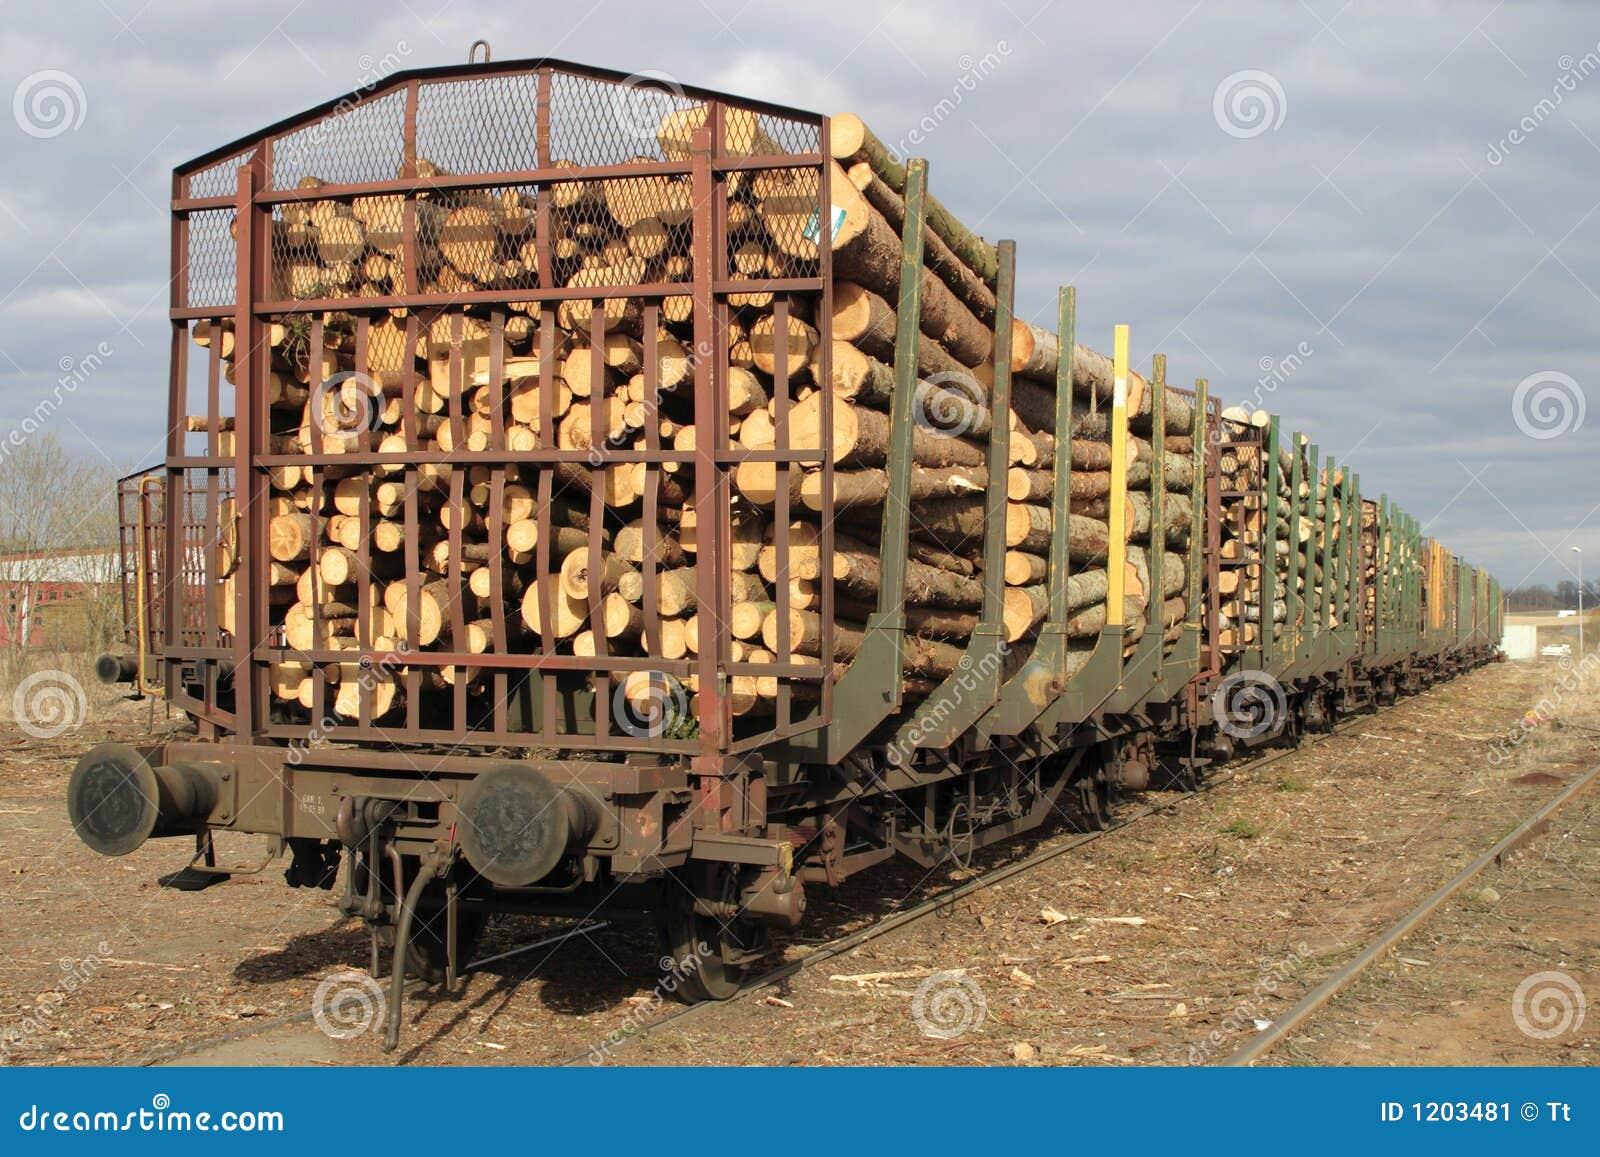 Lumber goods